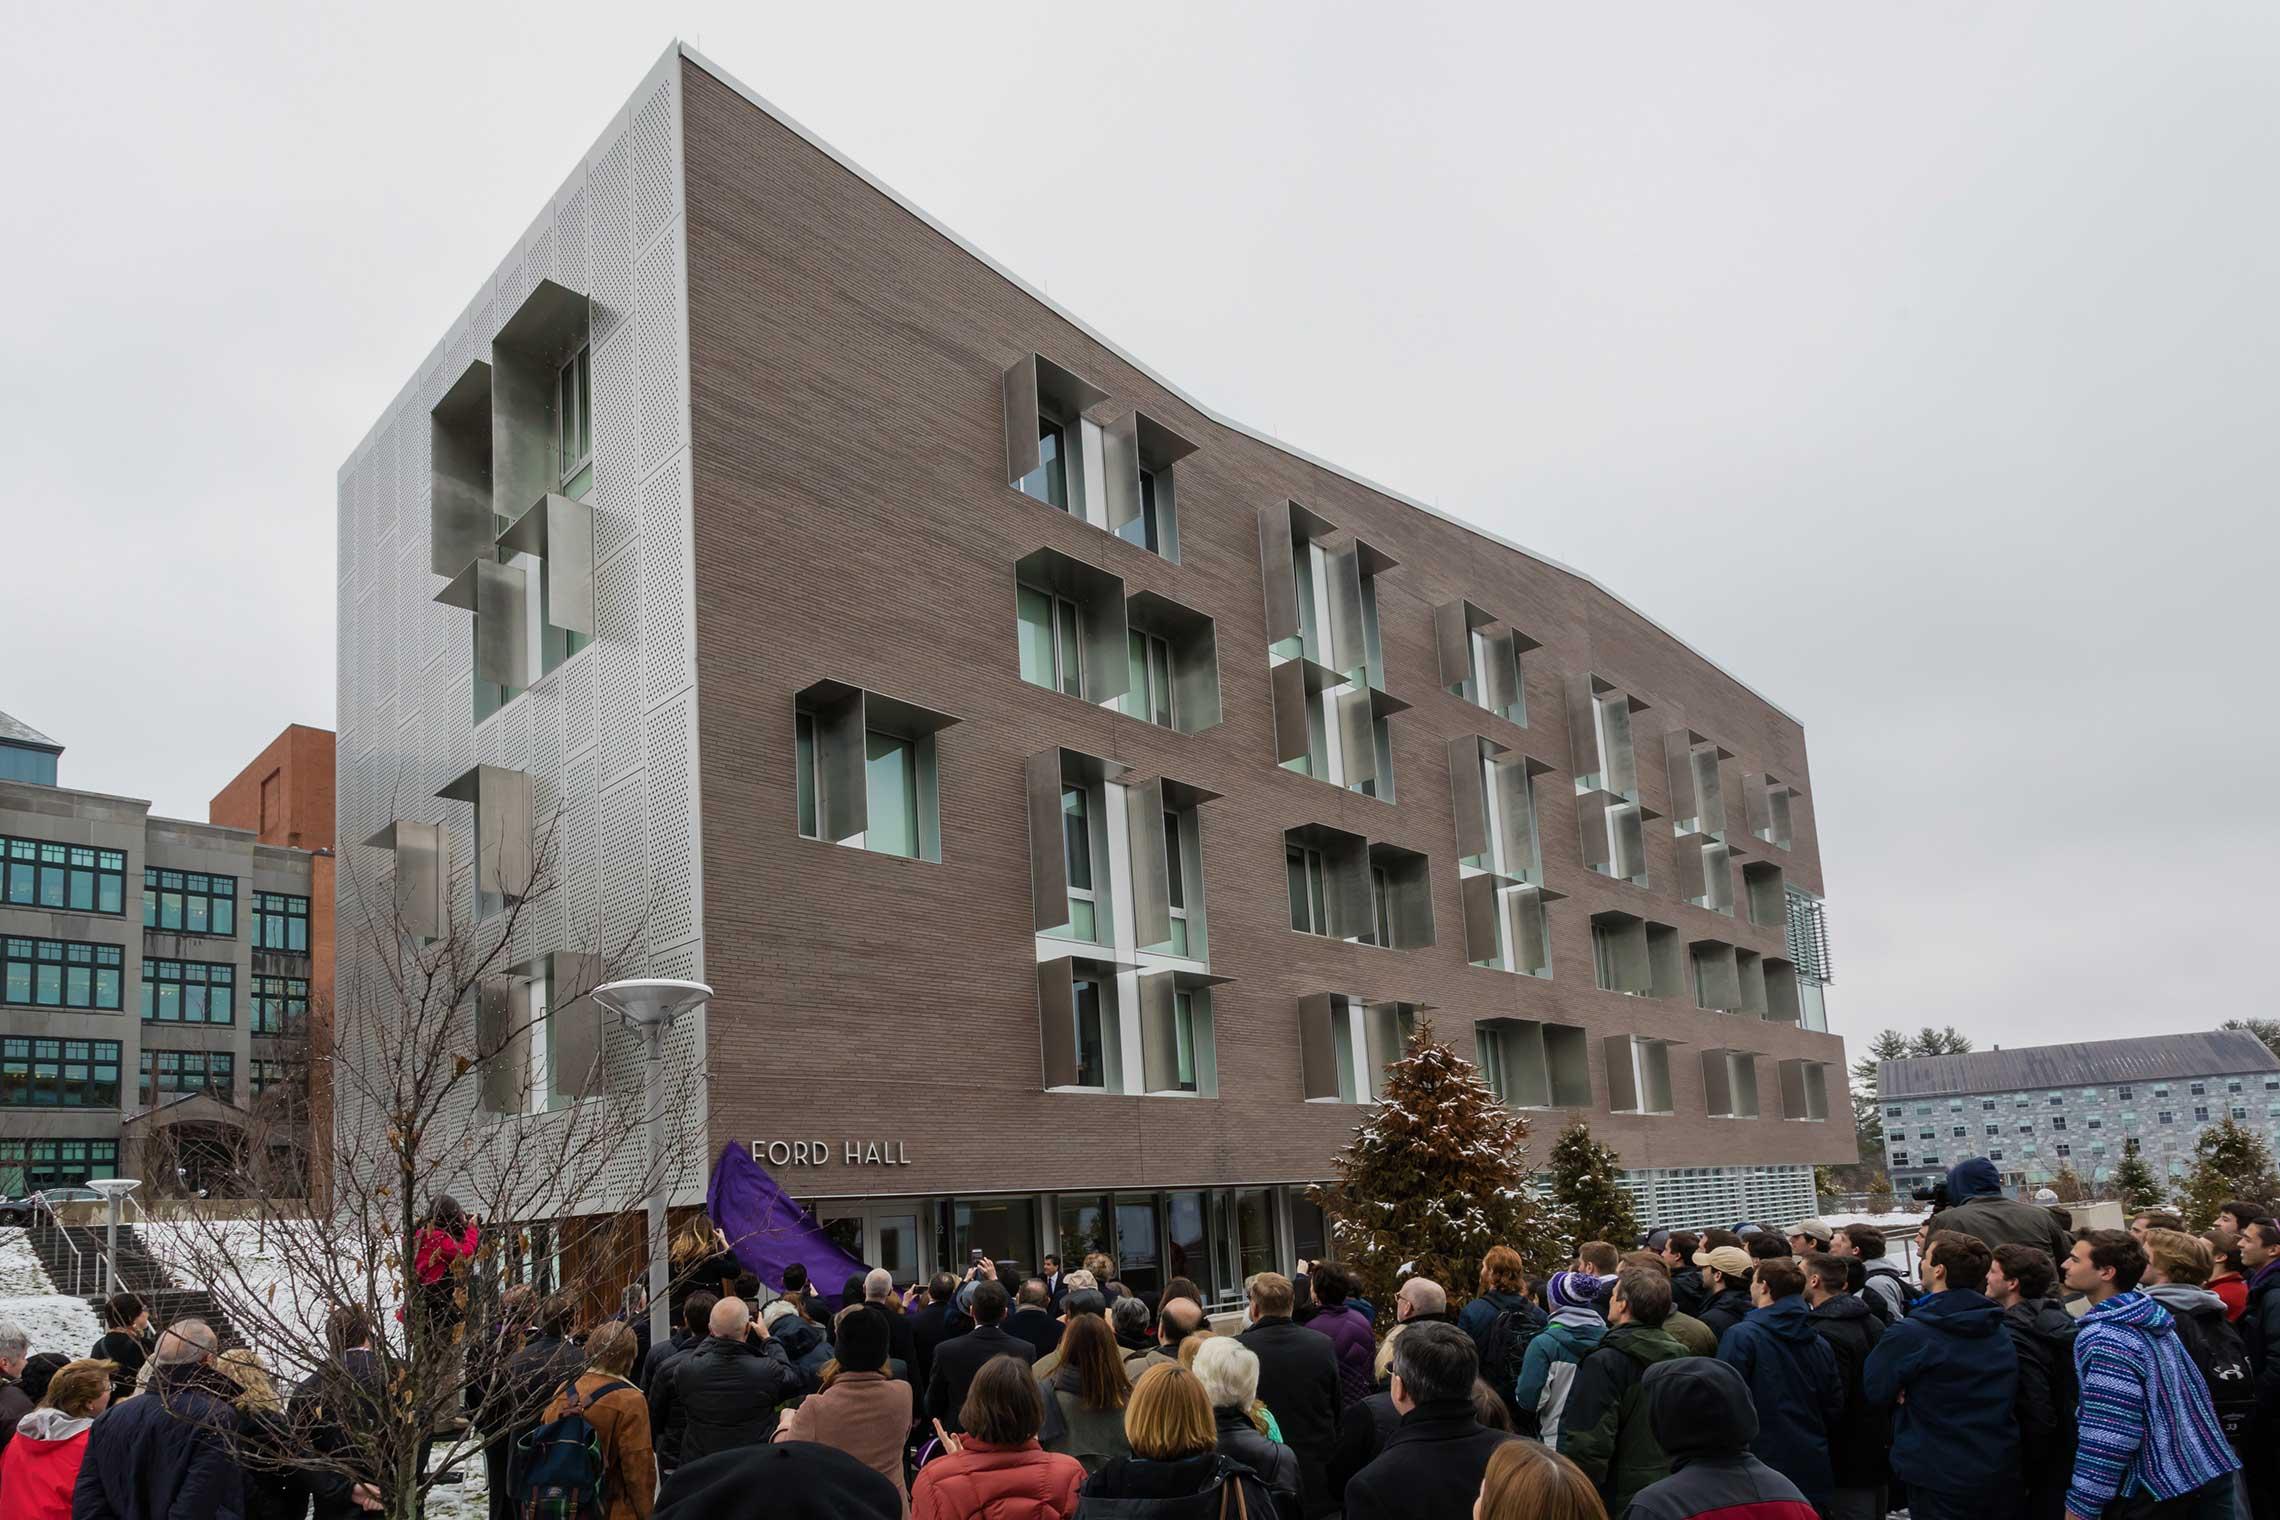 Ford Hall dedication ceremony